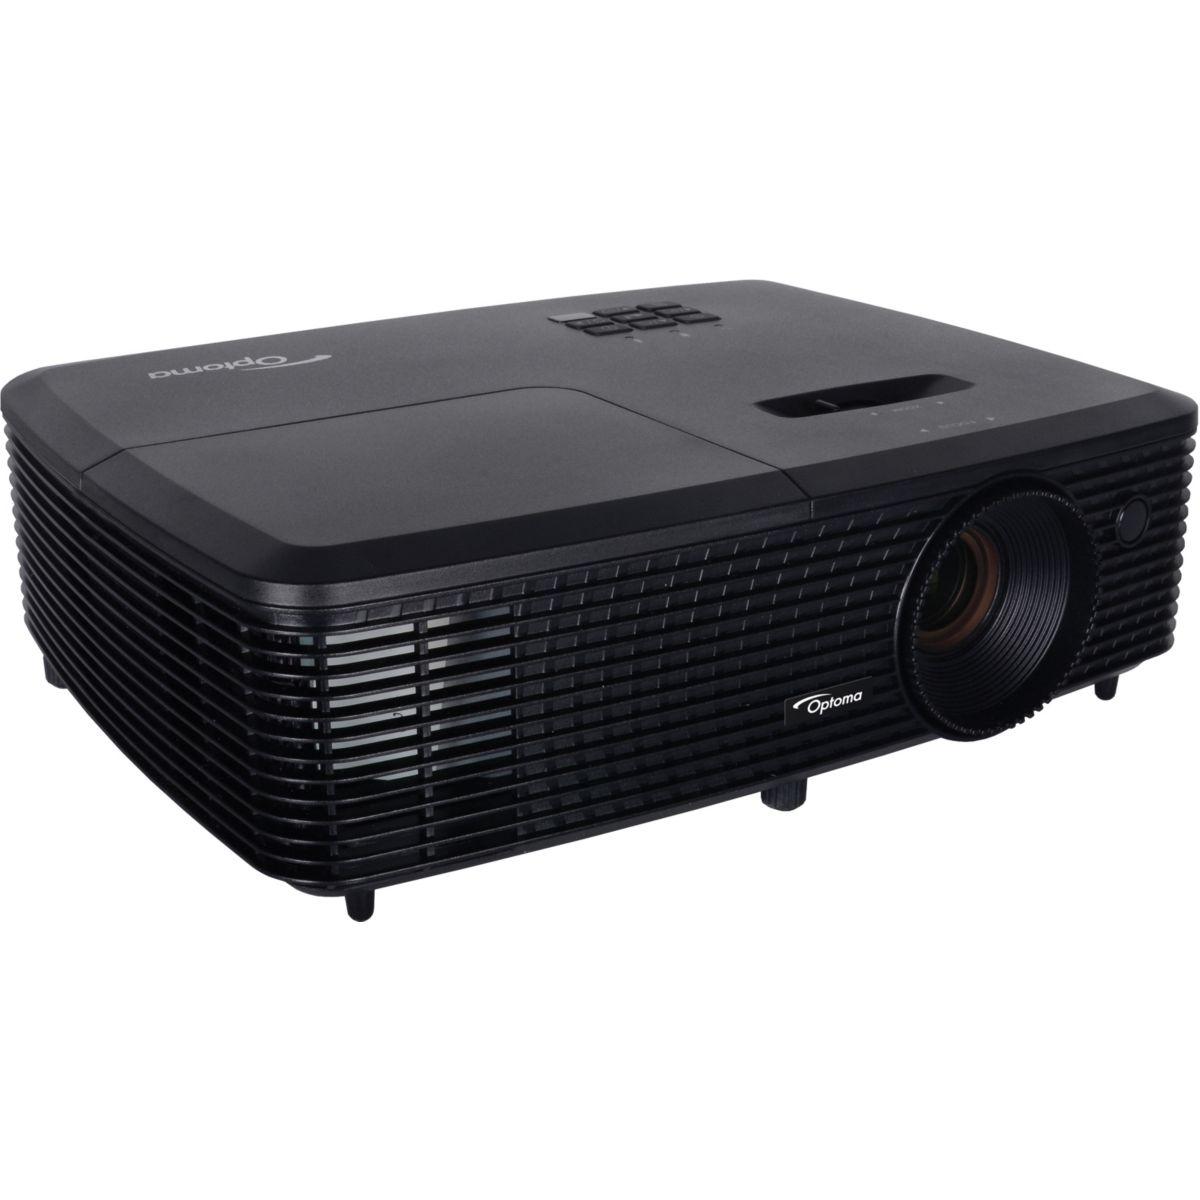 Vidéoprojecteur bureautique OPTOMA S331